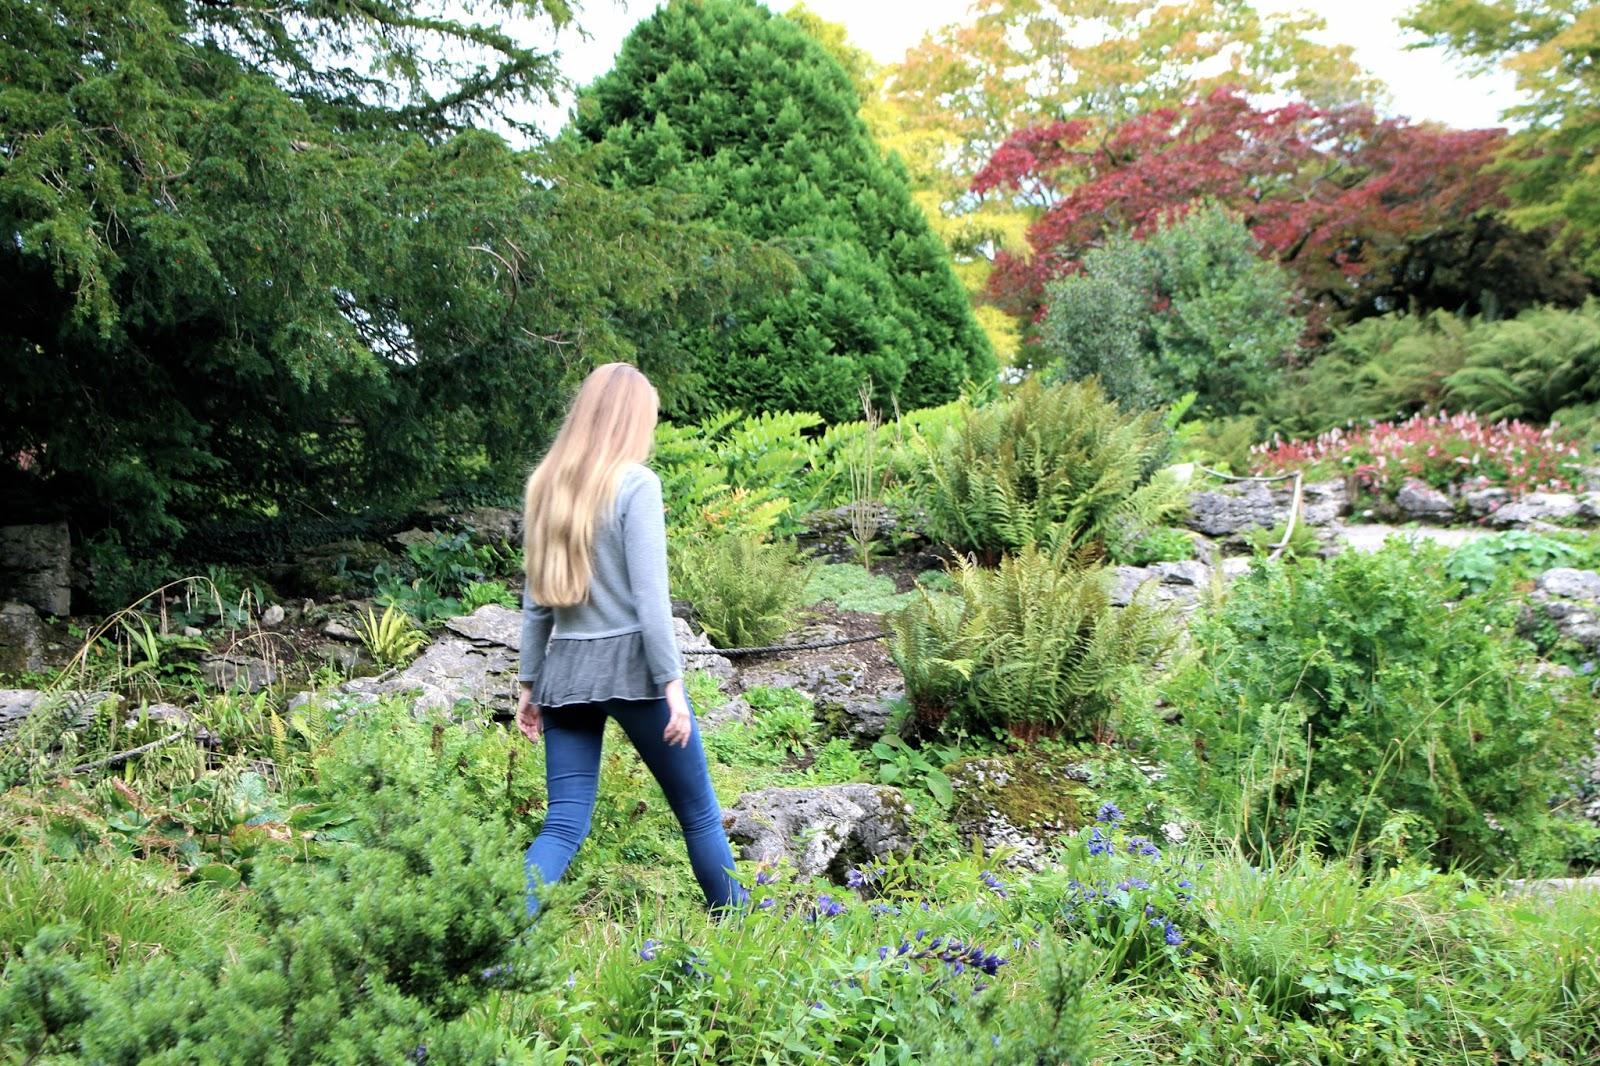 National Trust Sizergh Castle gardens in Kendal